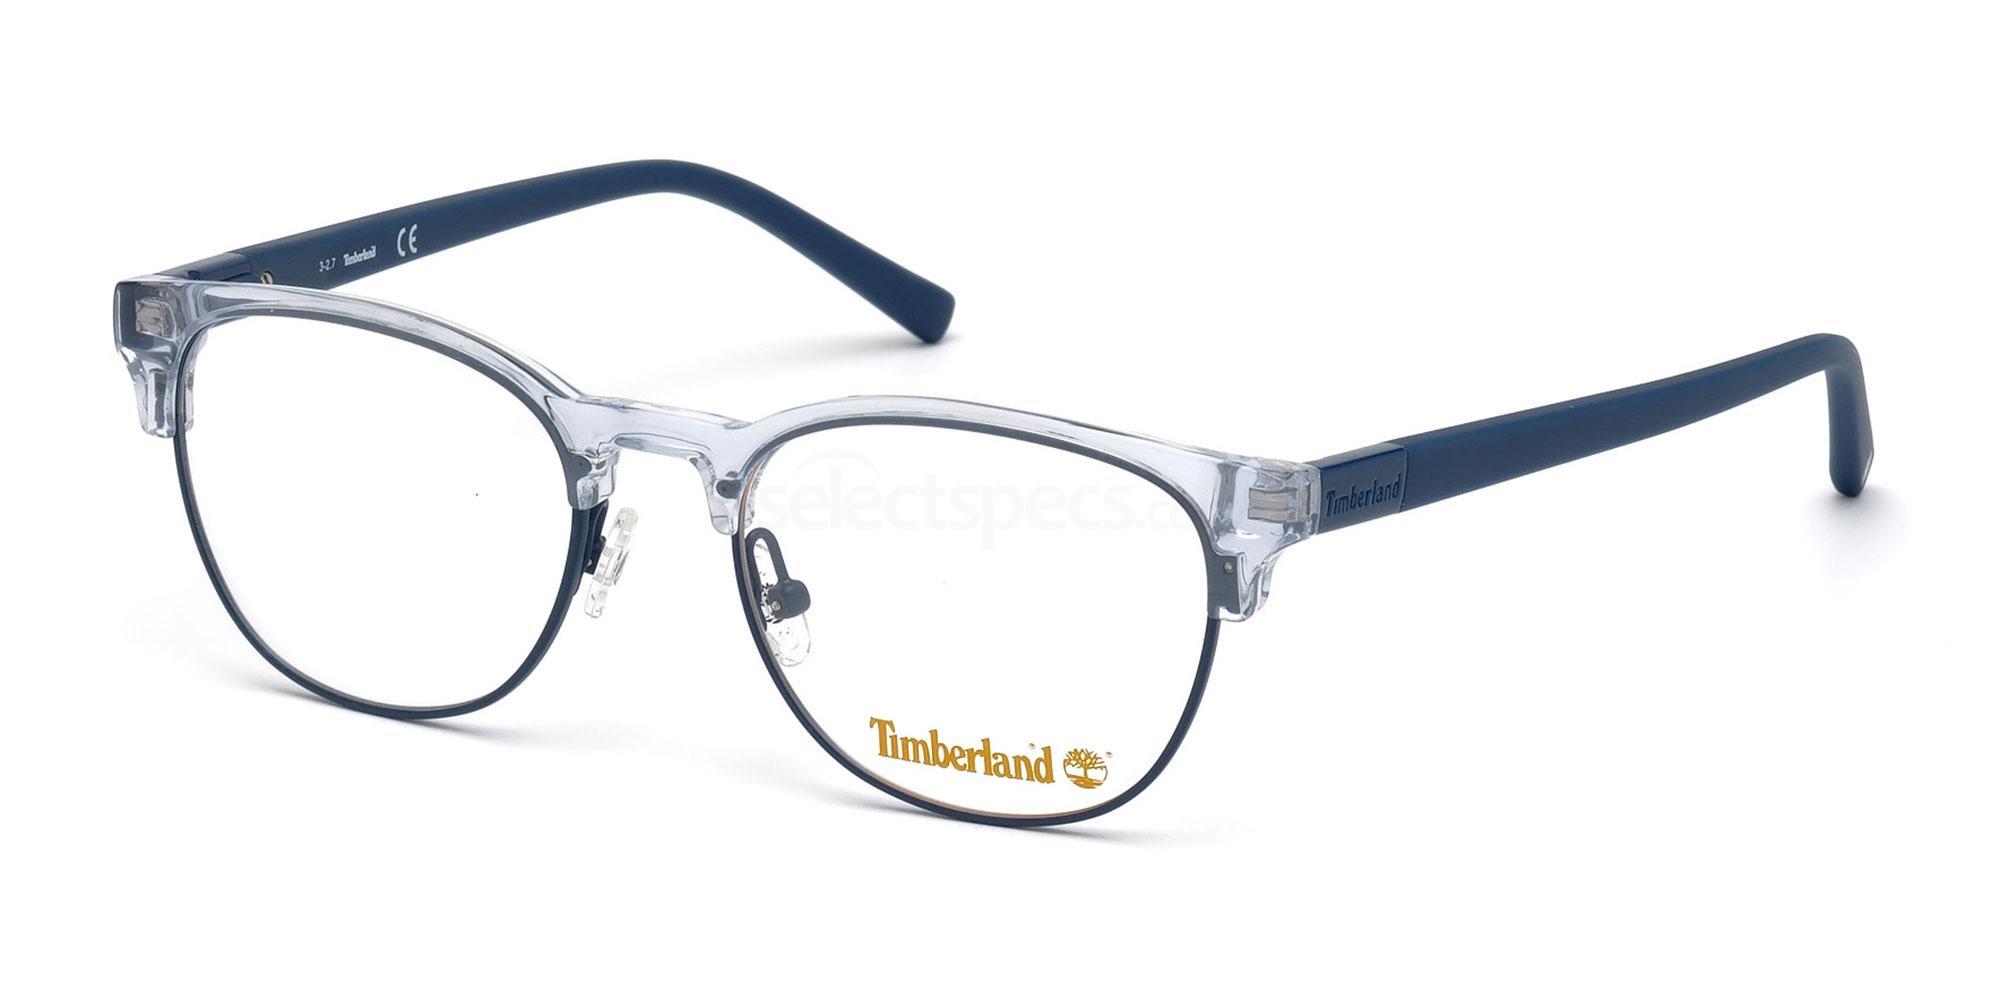 022 TB1602 Glasses, Timberland